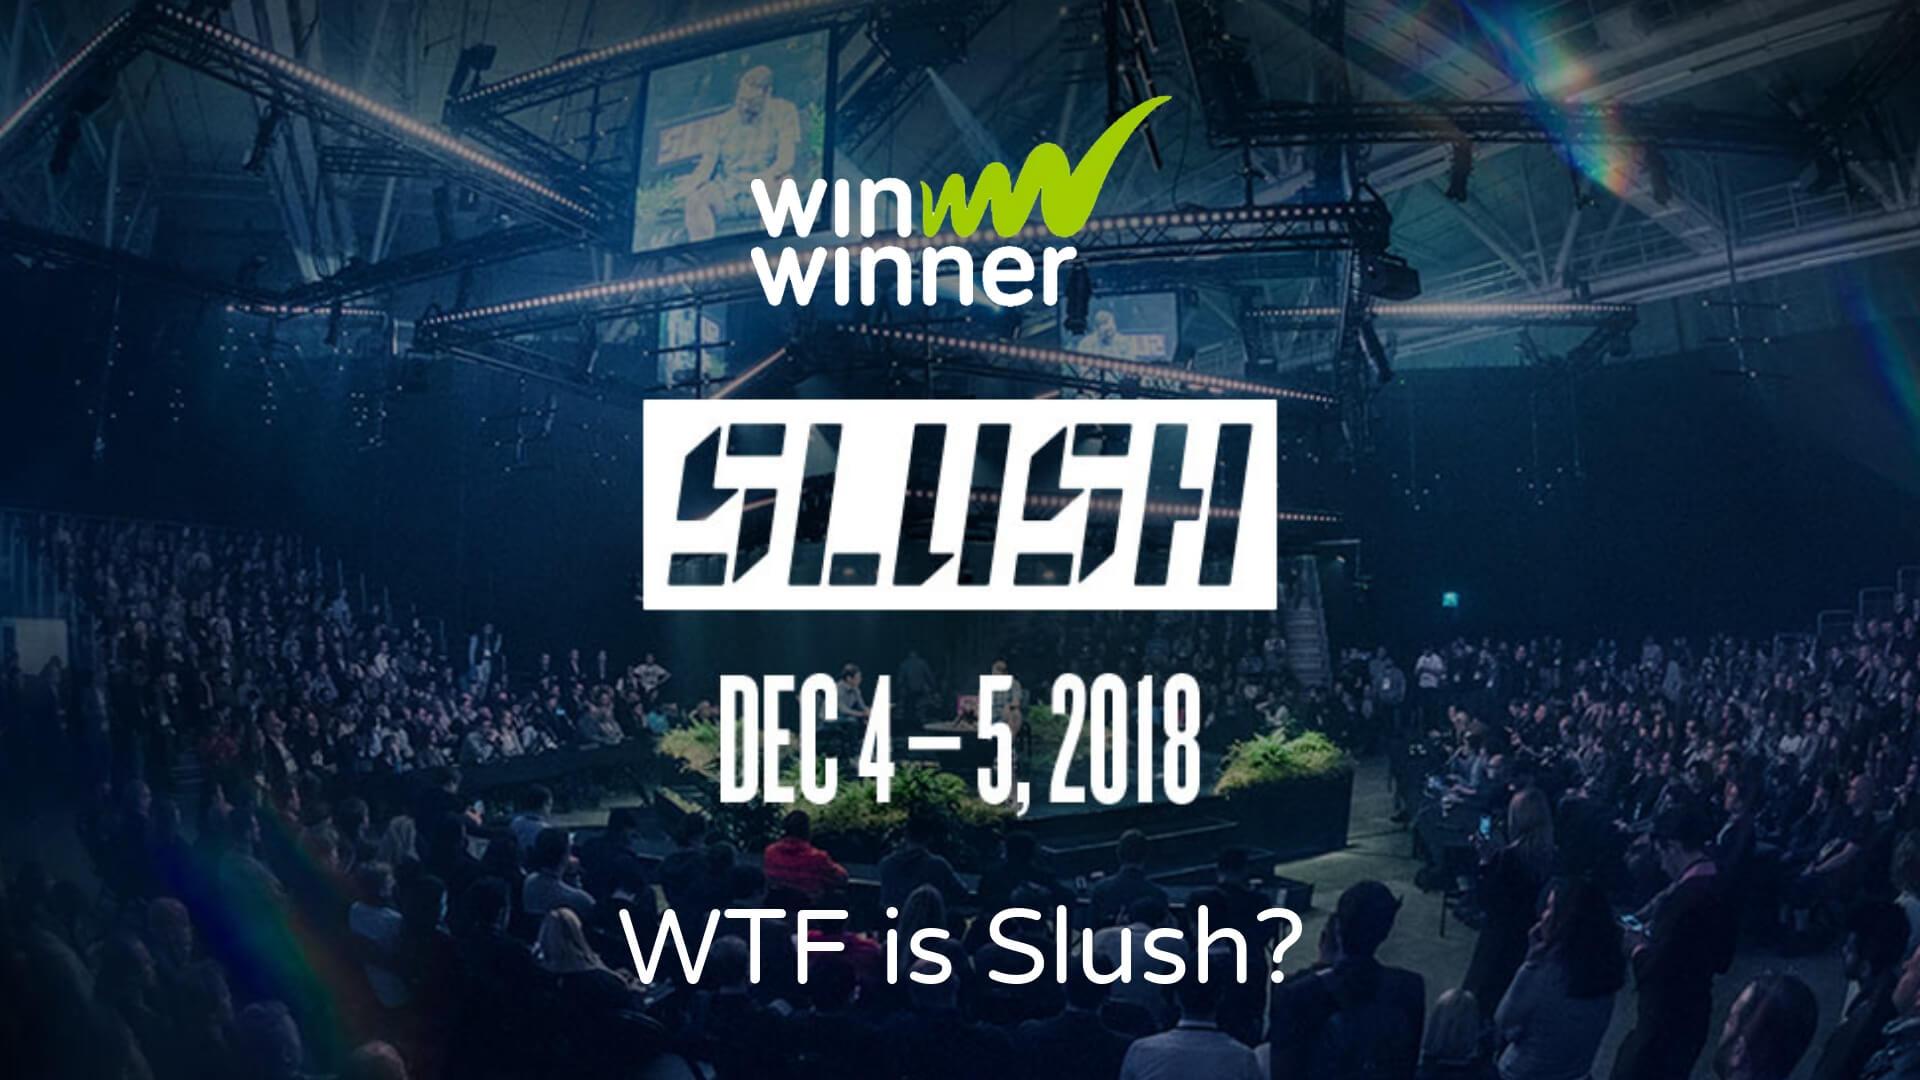 WinWinner @ Slush: Episode 1 - Wtf is Slush?!